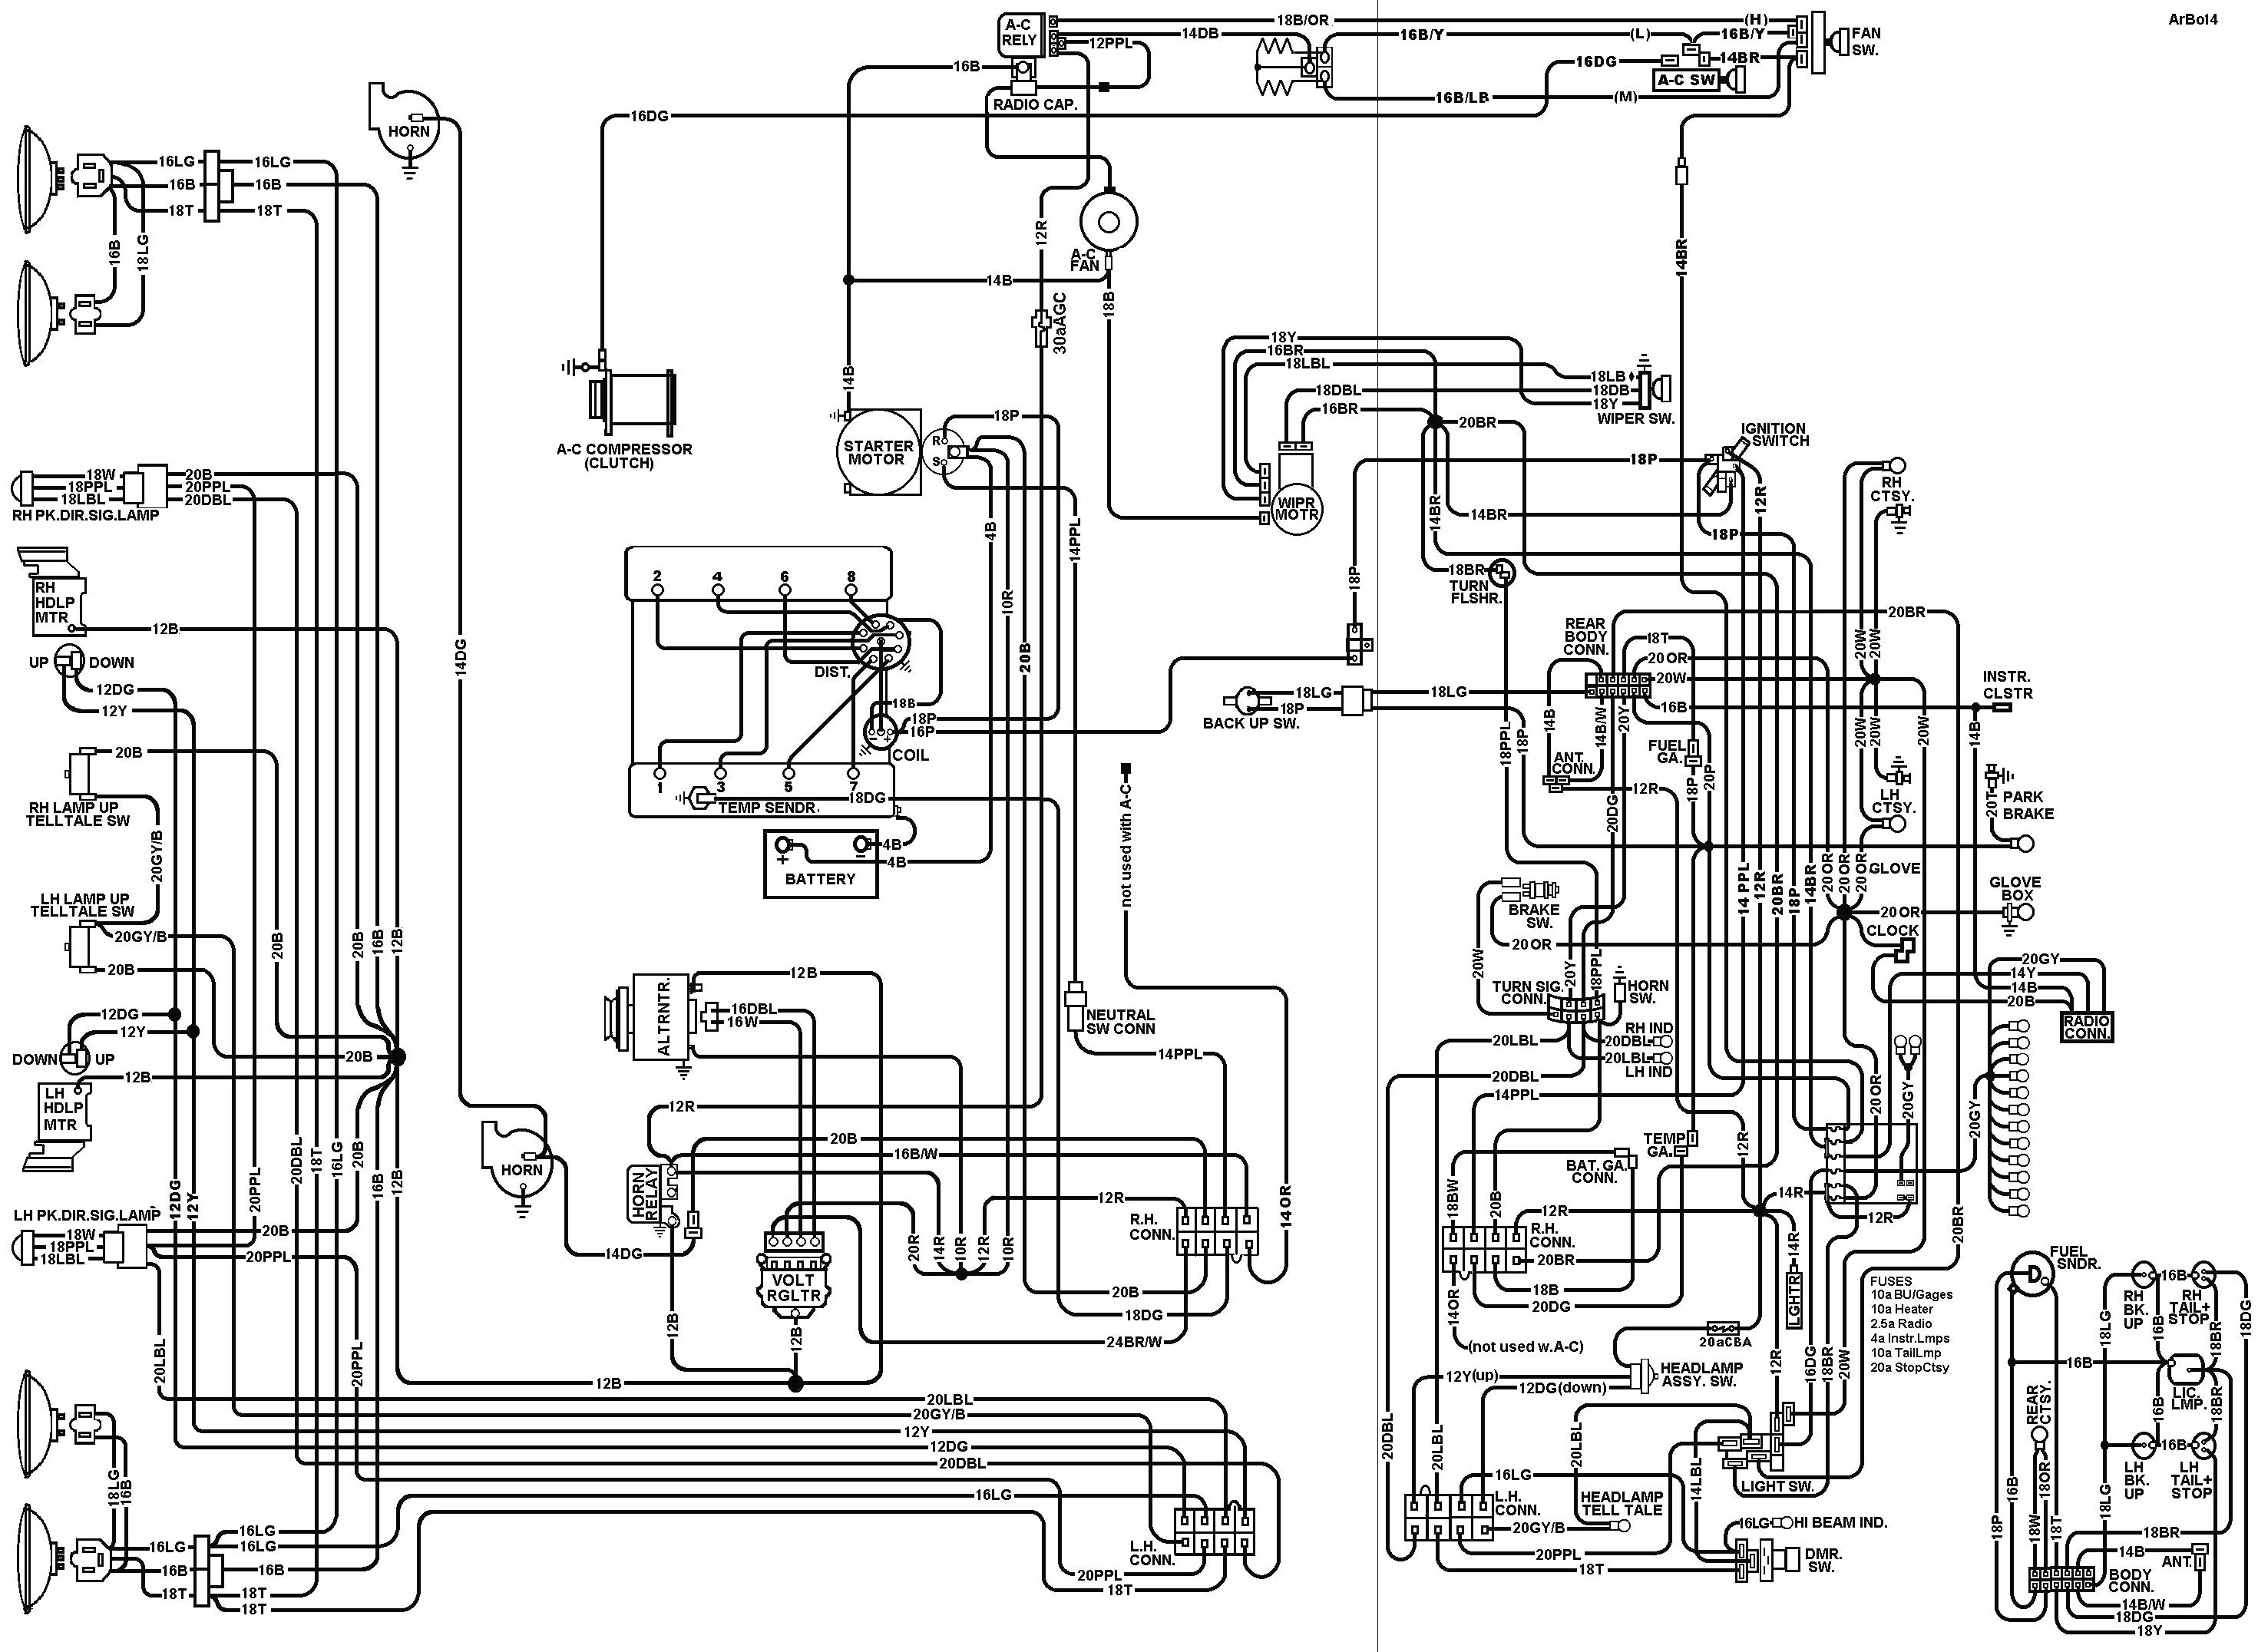 Diagram 2000 4r70w Wiring Diagram Full Version Hd Quality Wiring Diagram Schematicny2j Eticaenergetica It